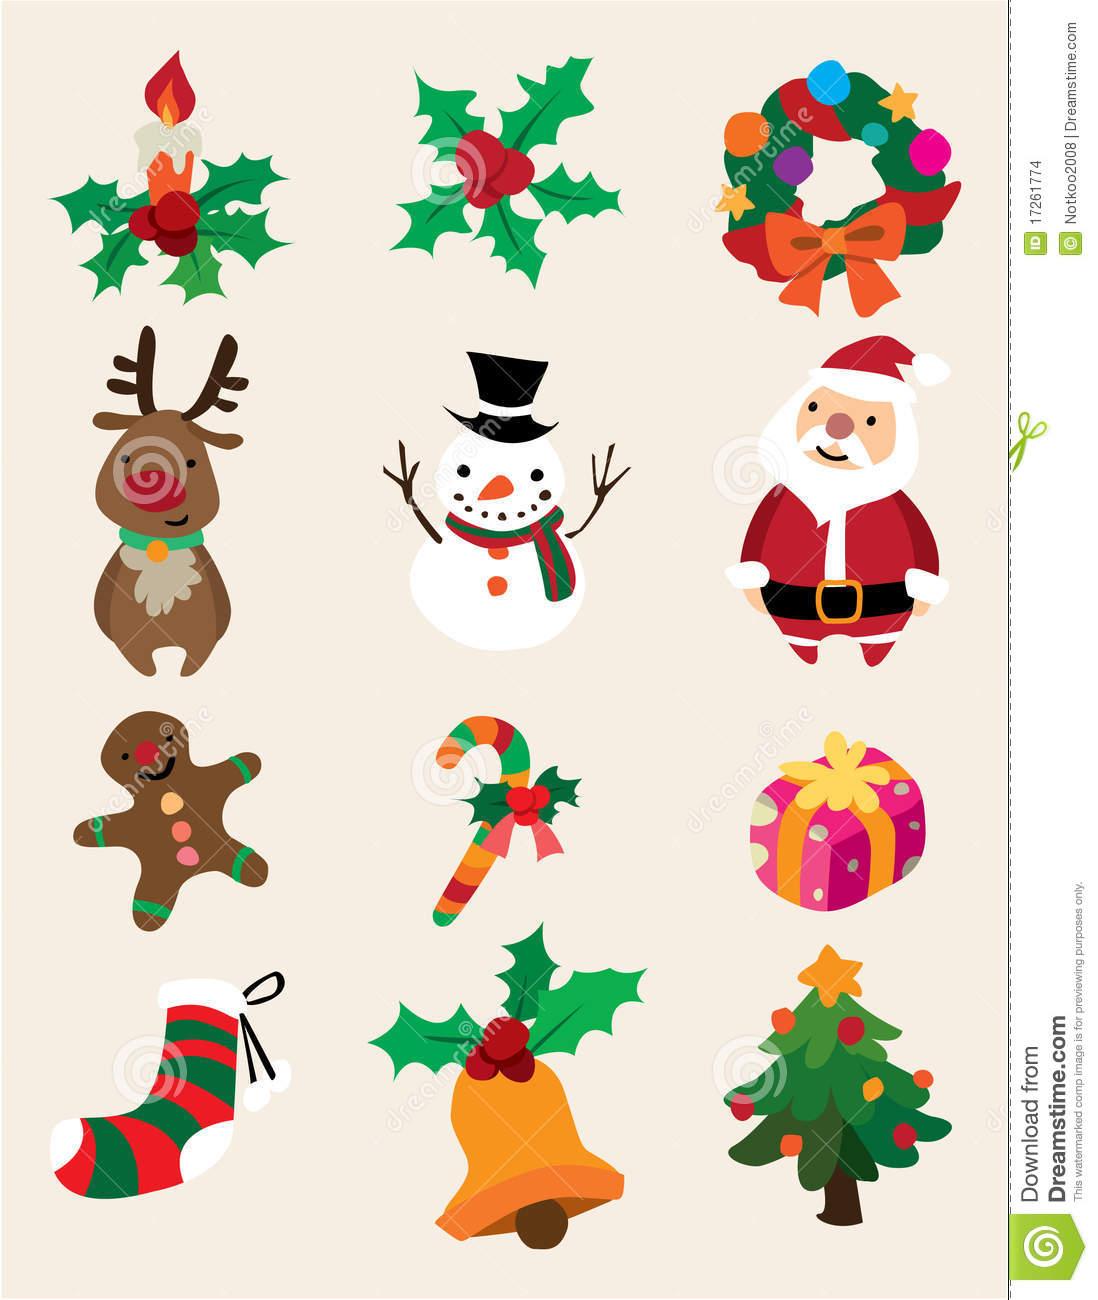 download cute christmas pictures wallpaper loadpaper   Quoteko 1098x1300